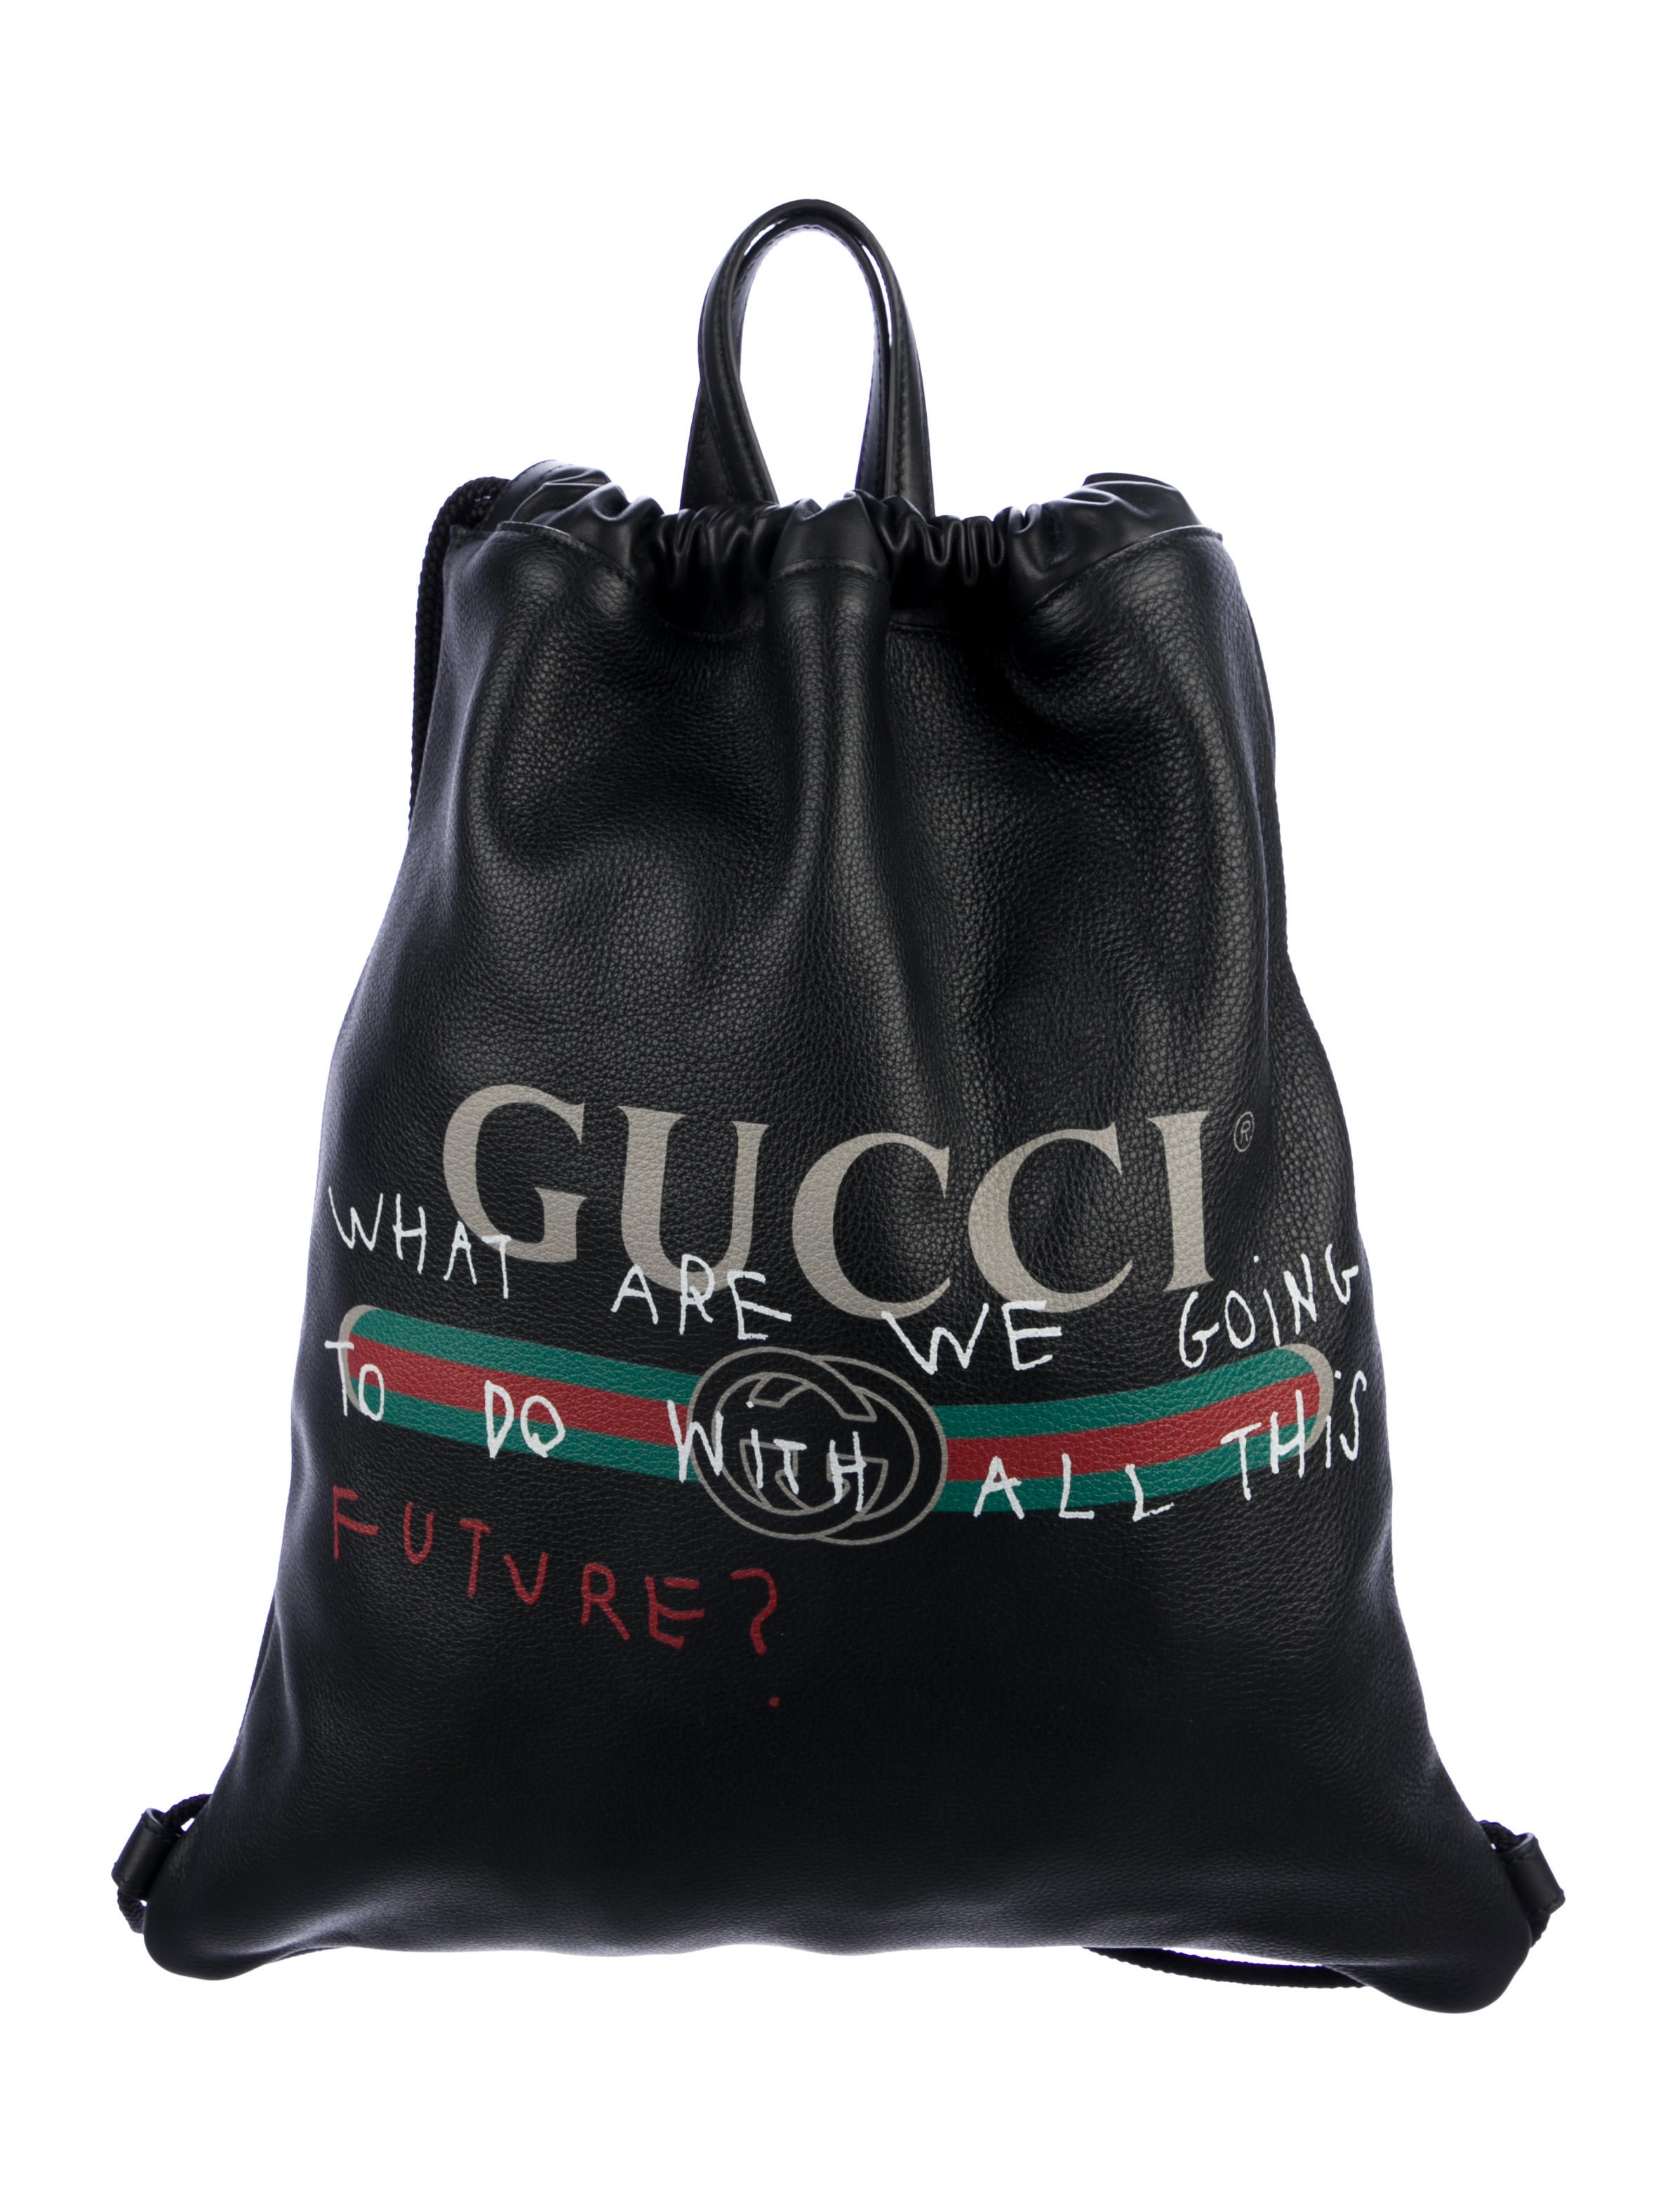 7d994ef08ed0 Gucci Coco Capitán Logo Drawstring Backpack - Handbags - GUC307362 ...